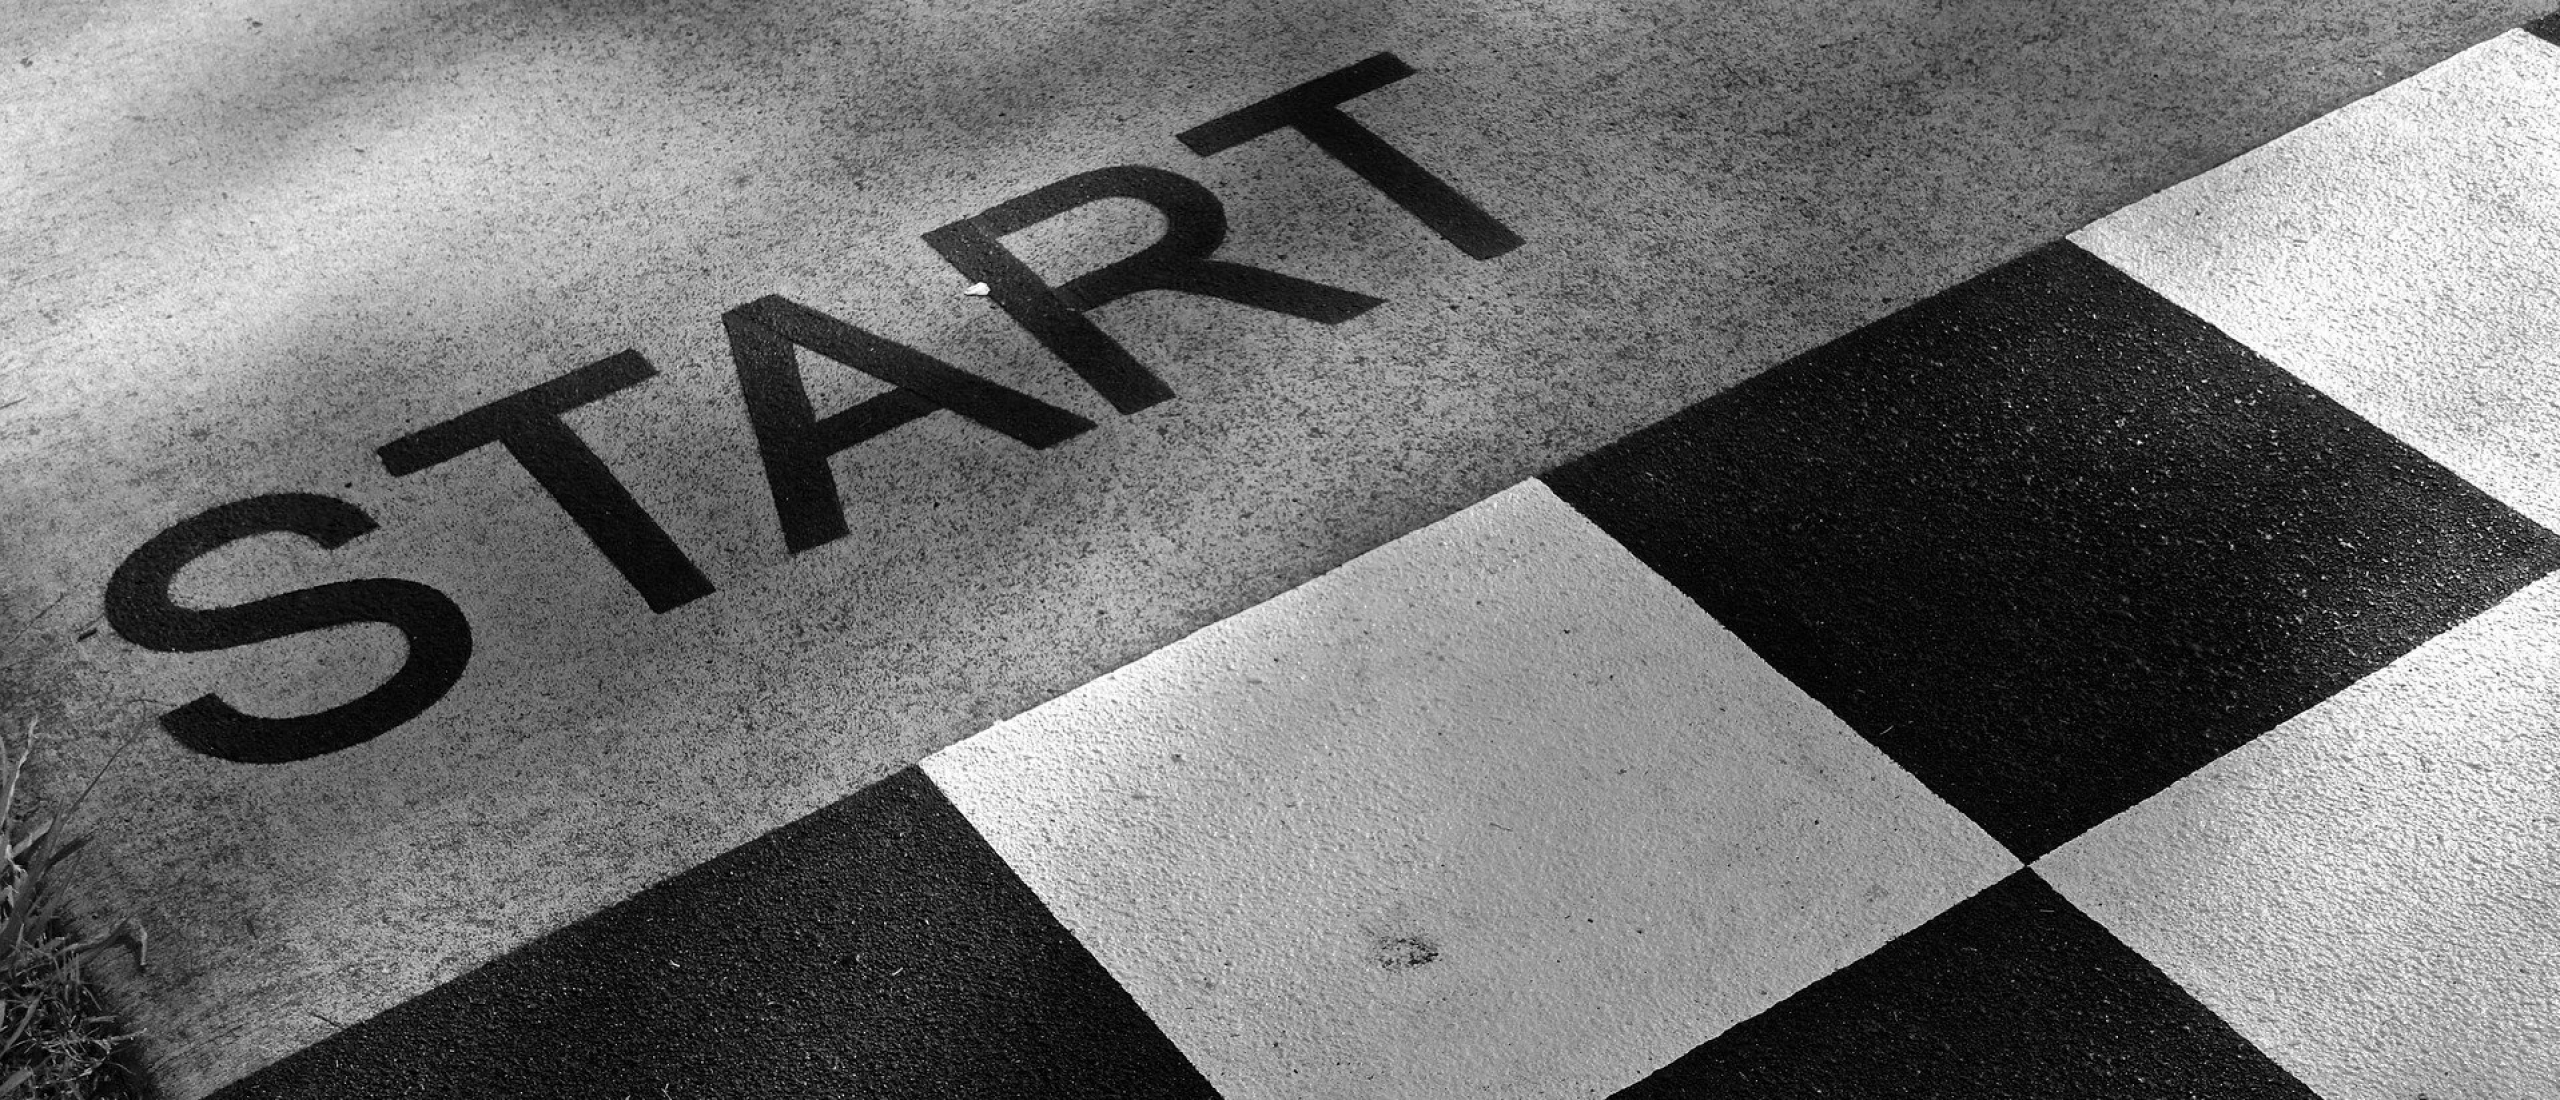 Beginnend leidinggevende? 5 praktische tips